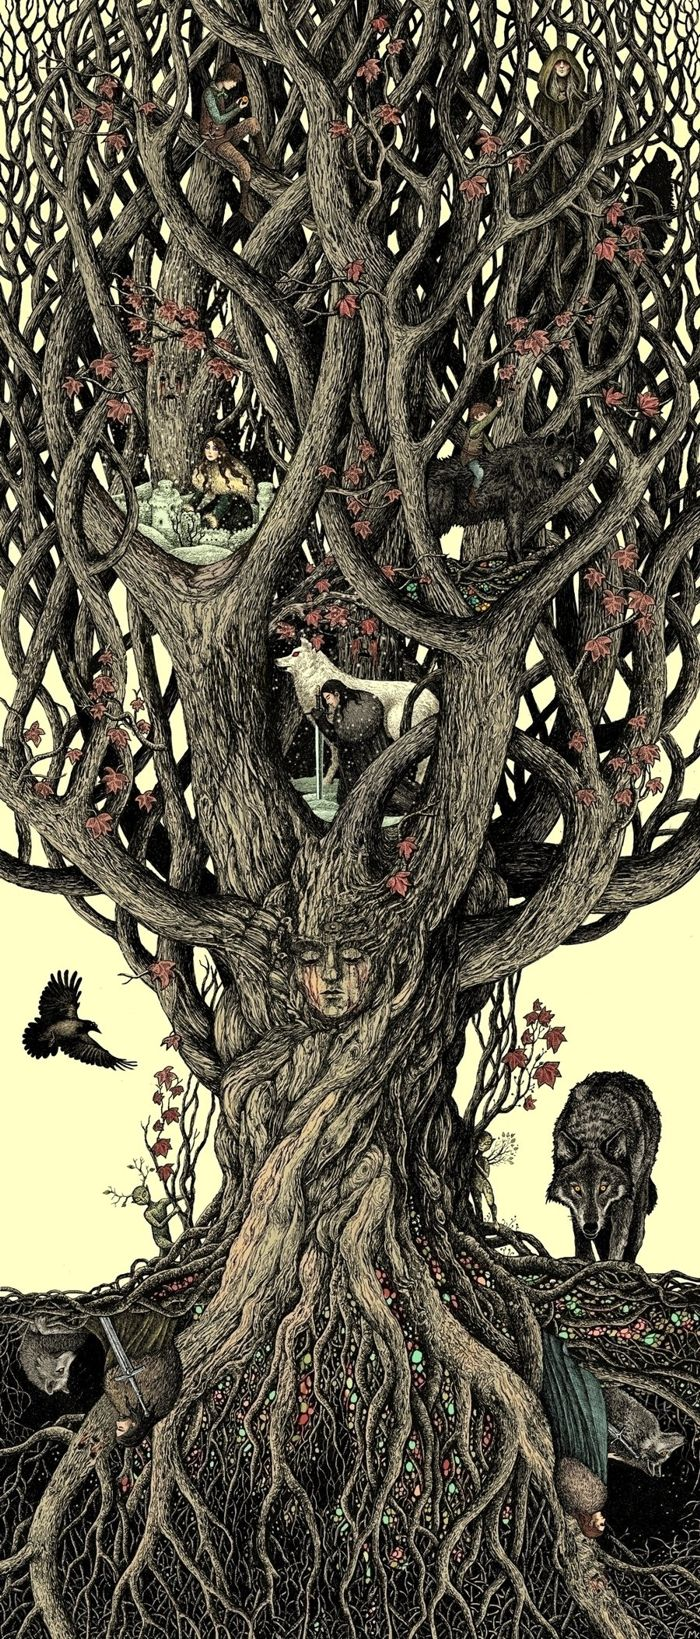 Les dessins au feutre de Magdalena Korzeniewska  Dessein de dessin